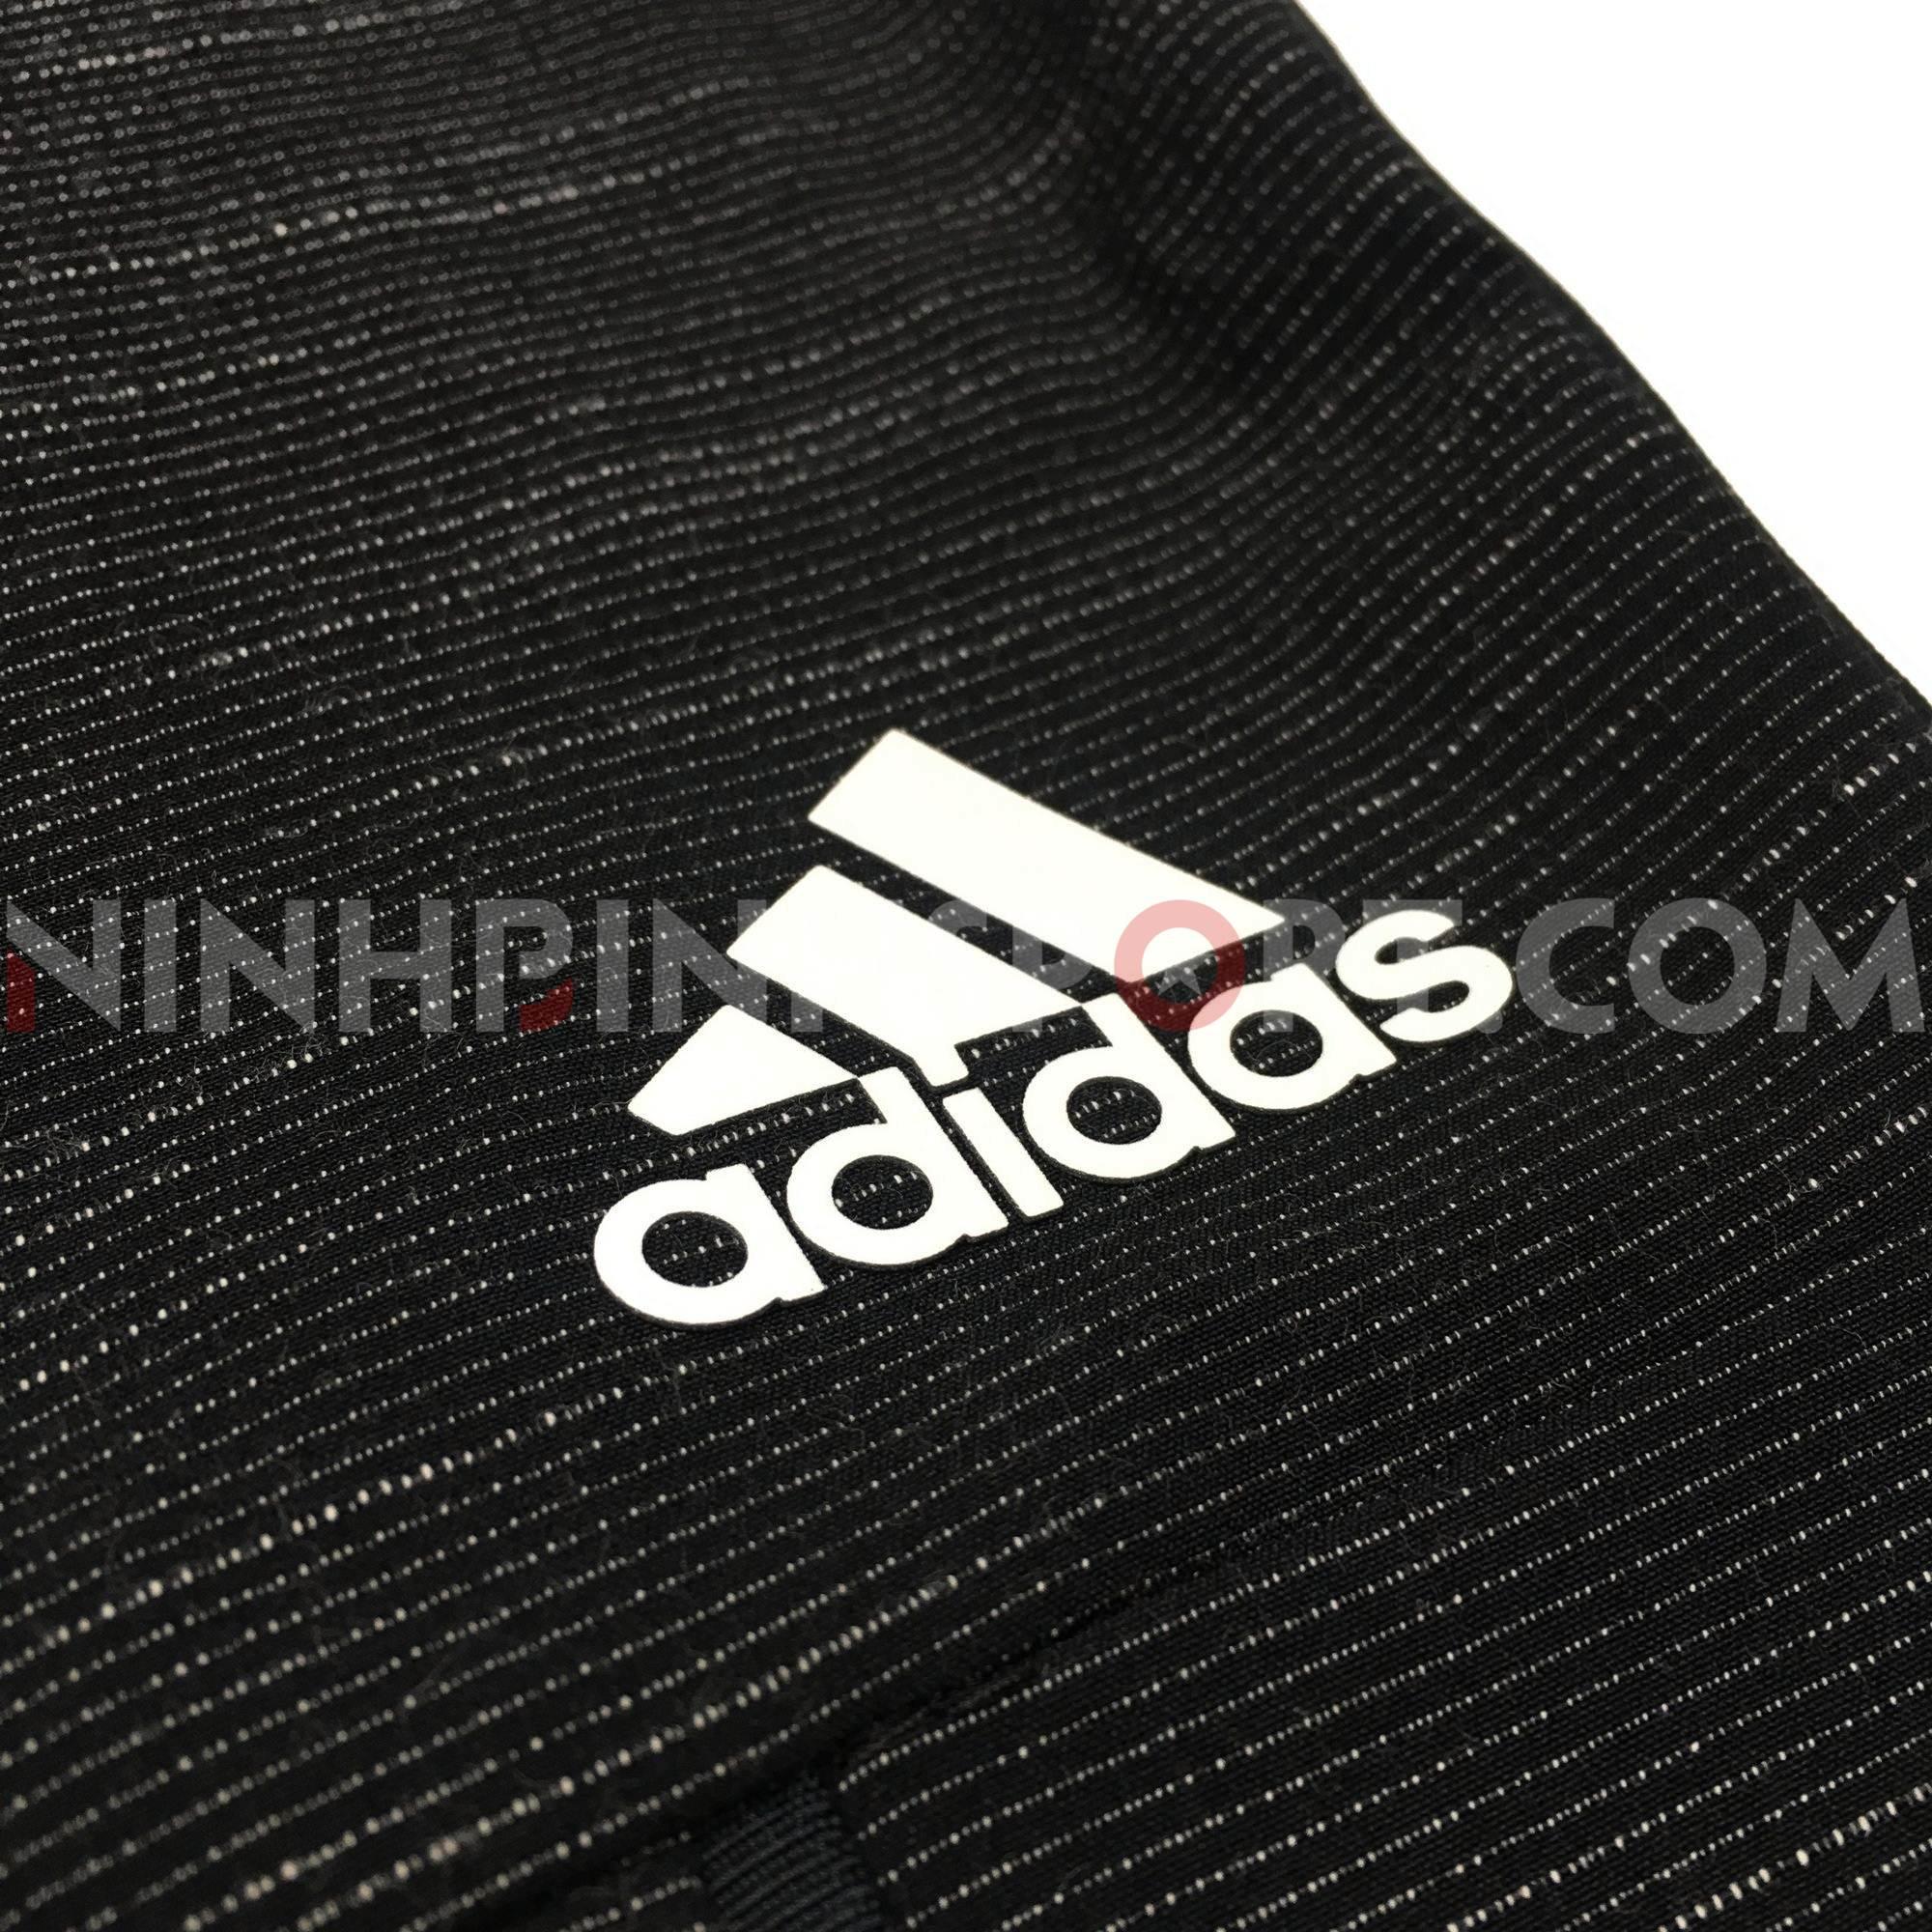 Áo khoác thể thao nam Adidas 24/7 Stretch Light WV DV1139